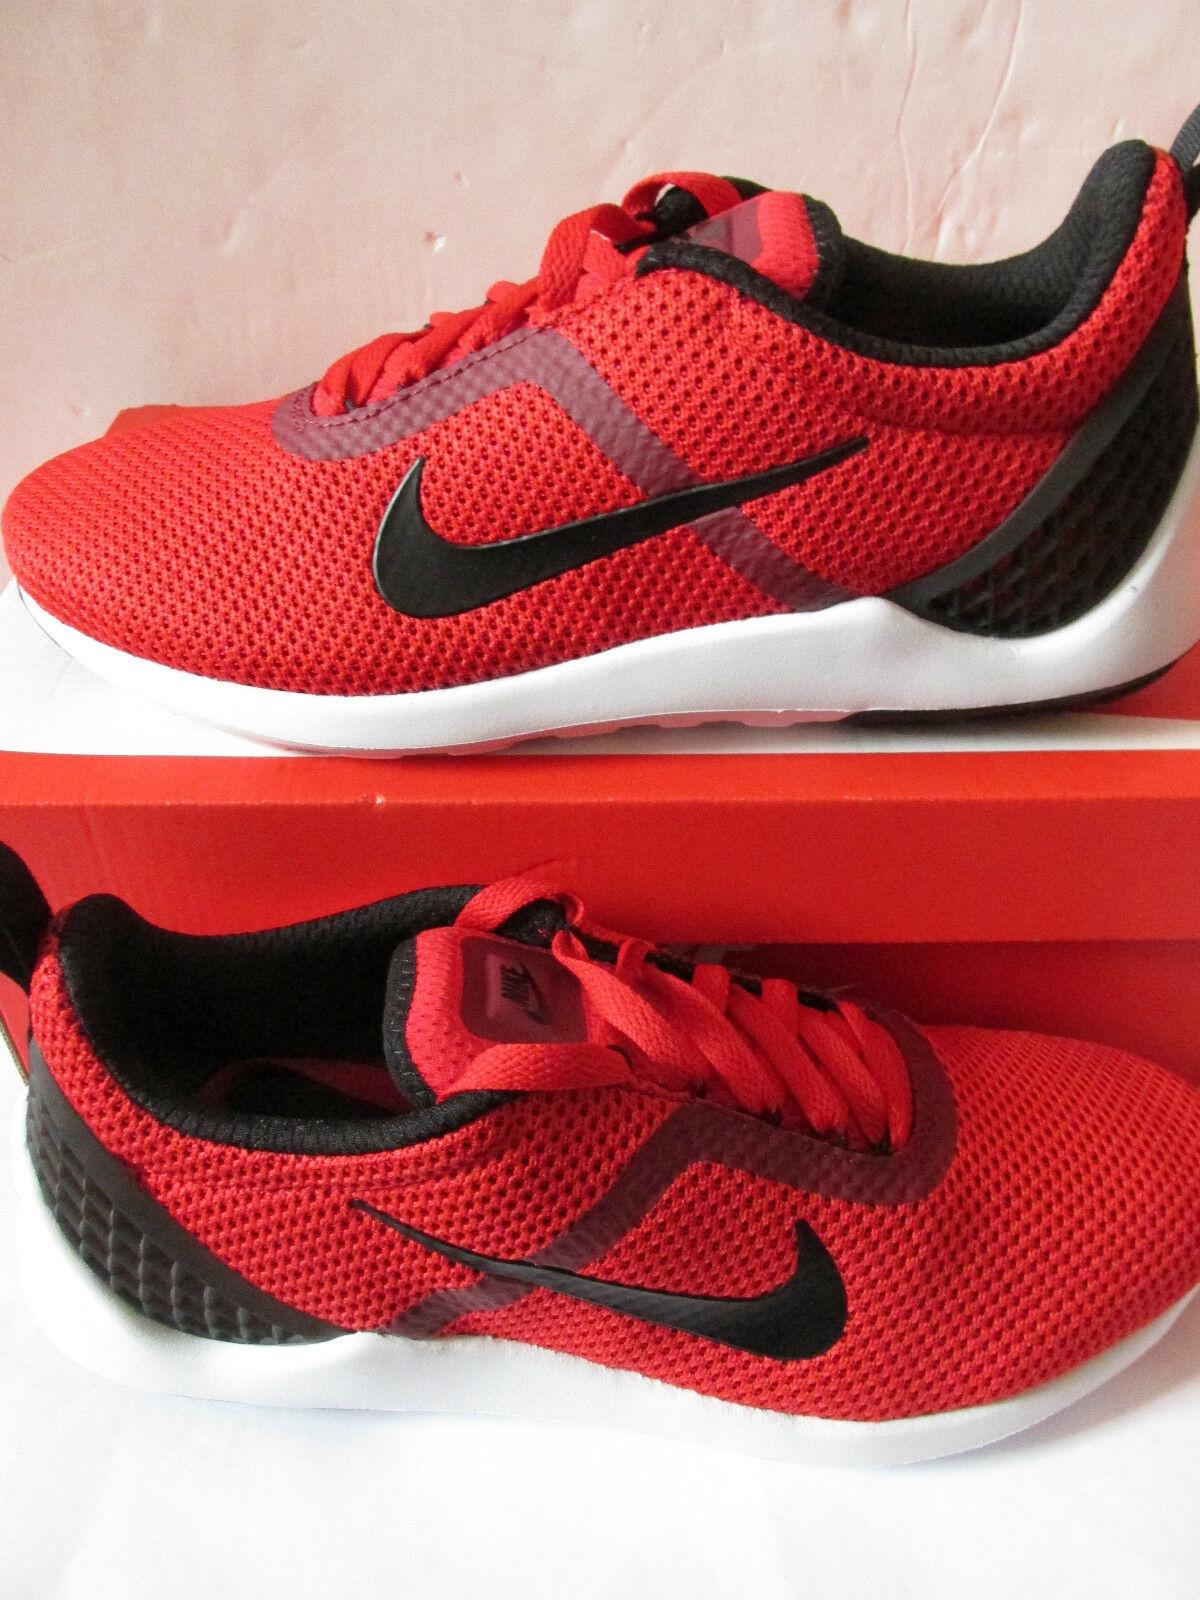 on sale e6095 153e7 Nike lunarestoa 2 2 2 essenziale Uomo correndo formatori 811372 600 scarpe,  scarpe b96f4d